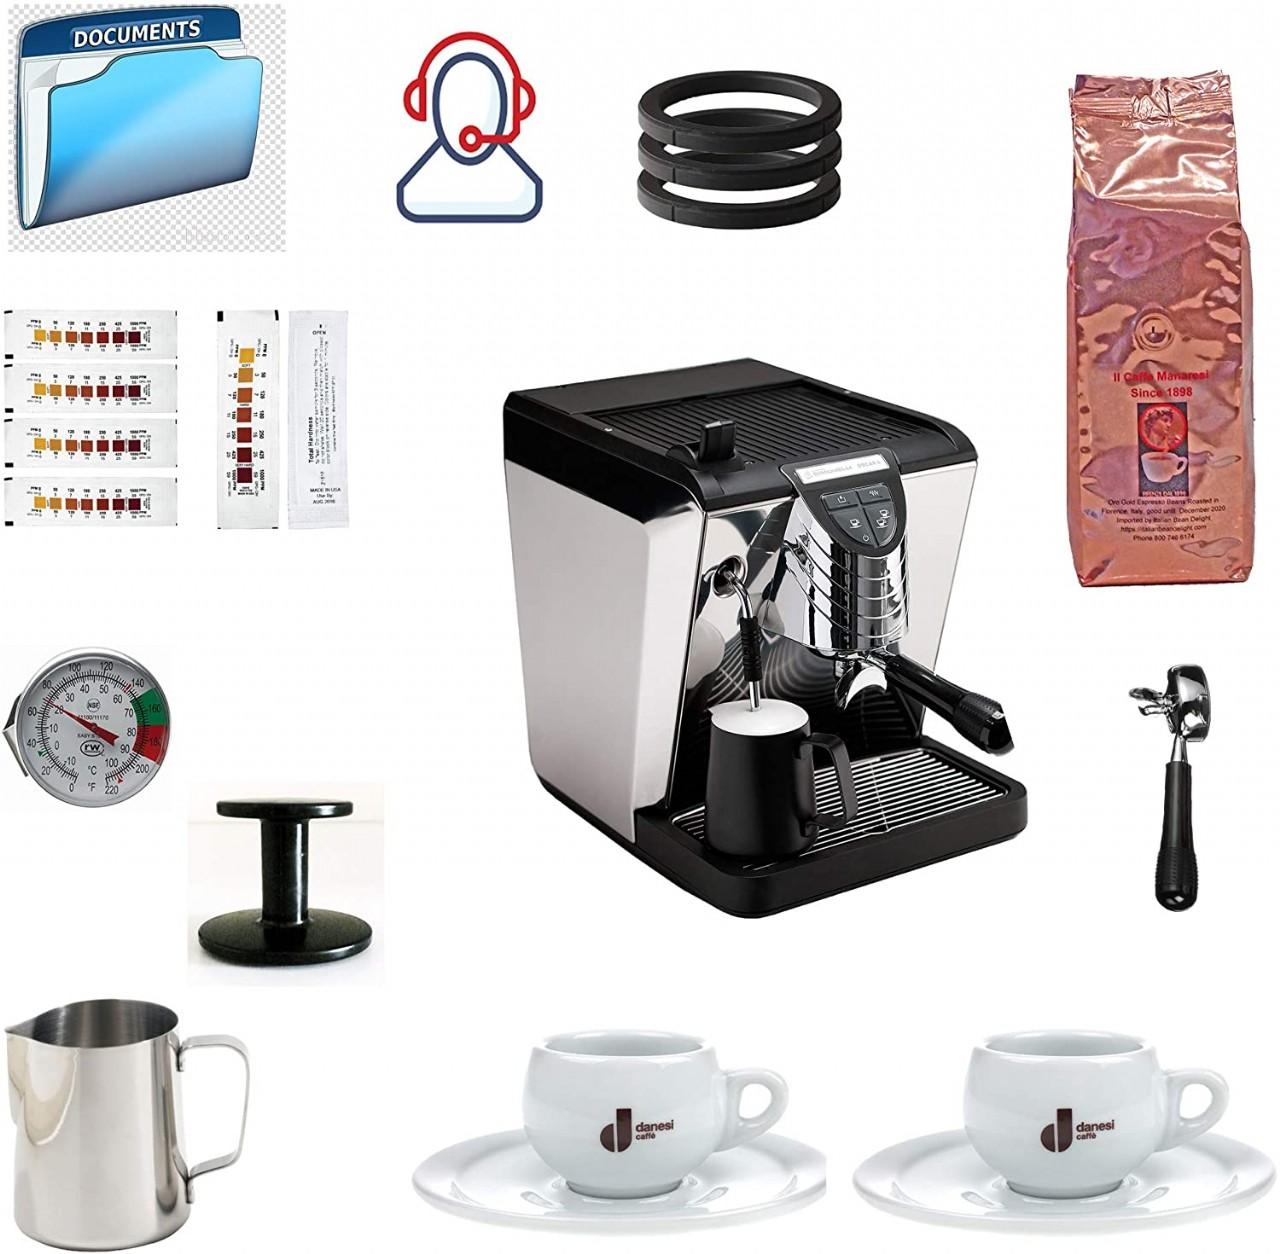 Simonelli Oscar Tank Black Espresso Machine Bundle with Coffee, Latte Gear Accessories (11 Items)